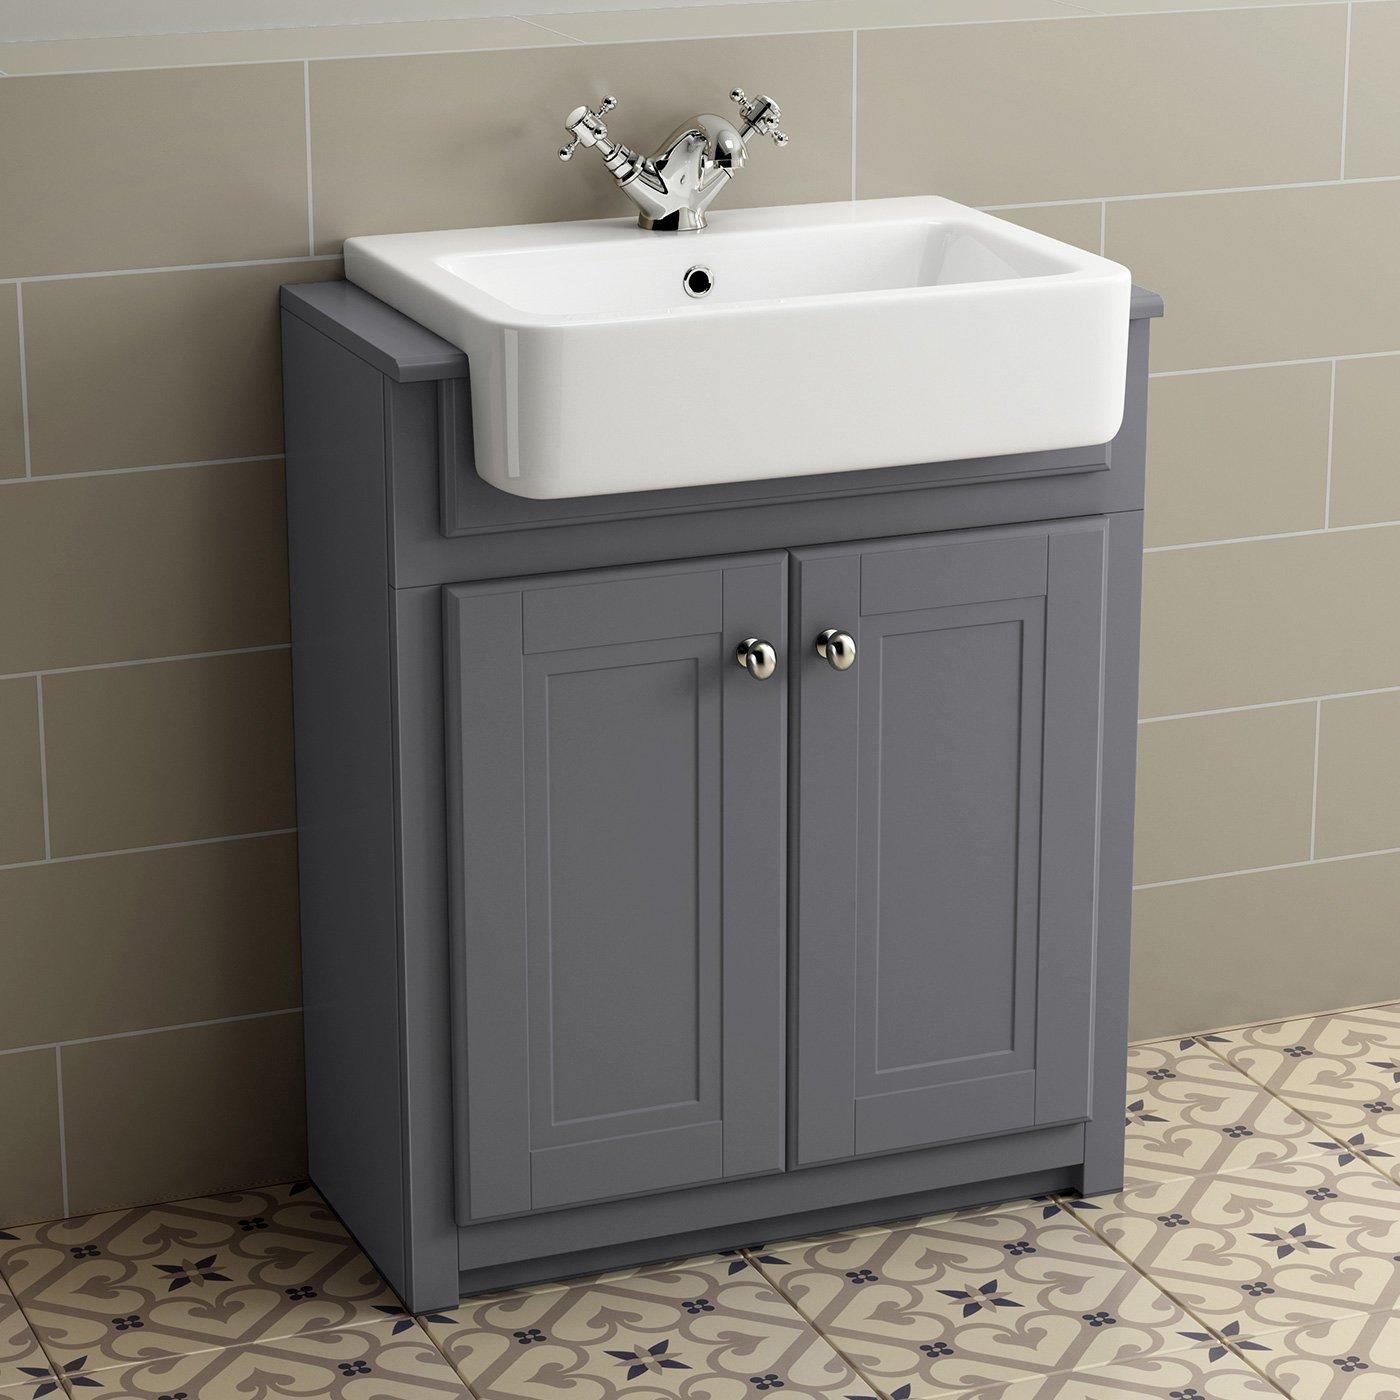 bathroom vanity sink units. 830mm Grey Basin Vanity Cabinet Bathroom Storage Furniture Deep Sink  Cupboard Unit Traditional Floorstanding Smooth Ivory